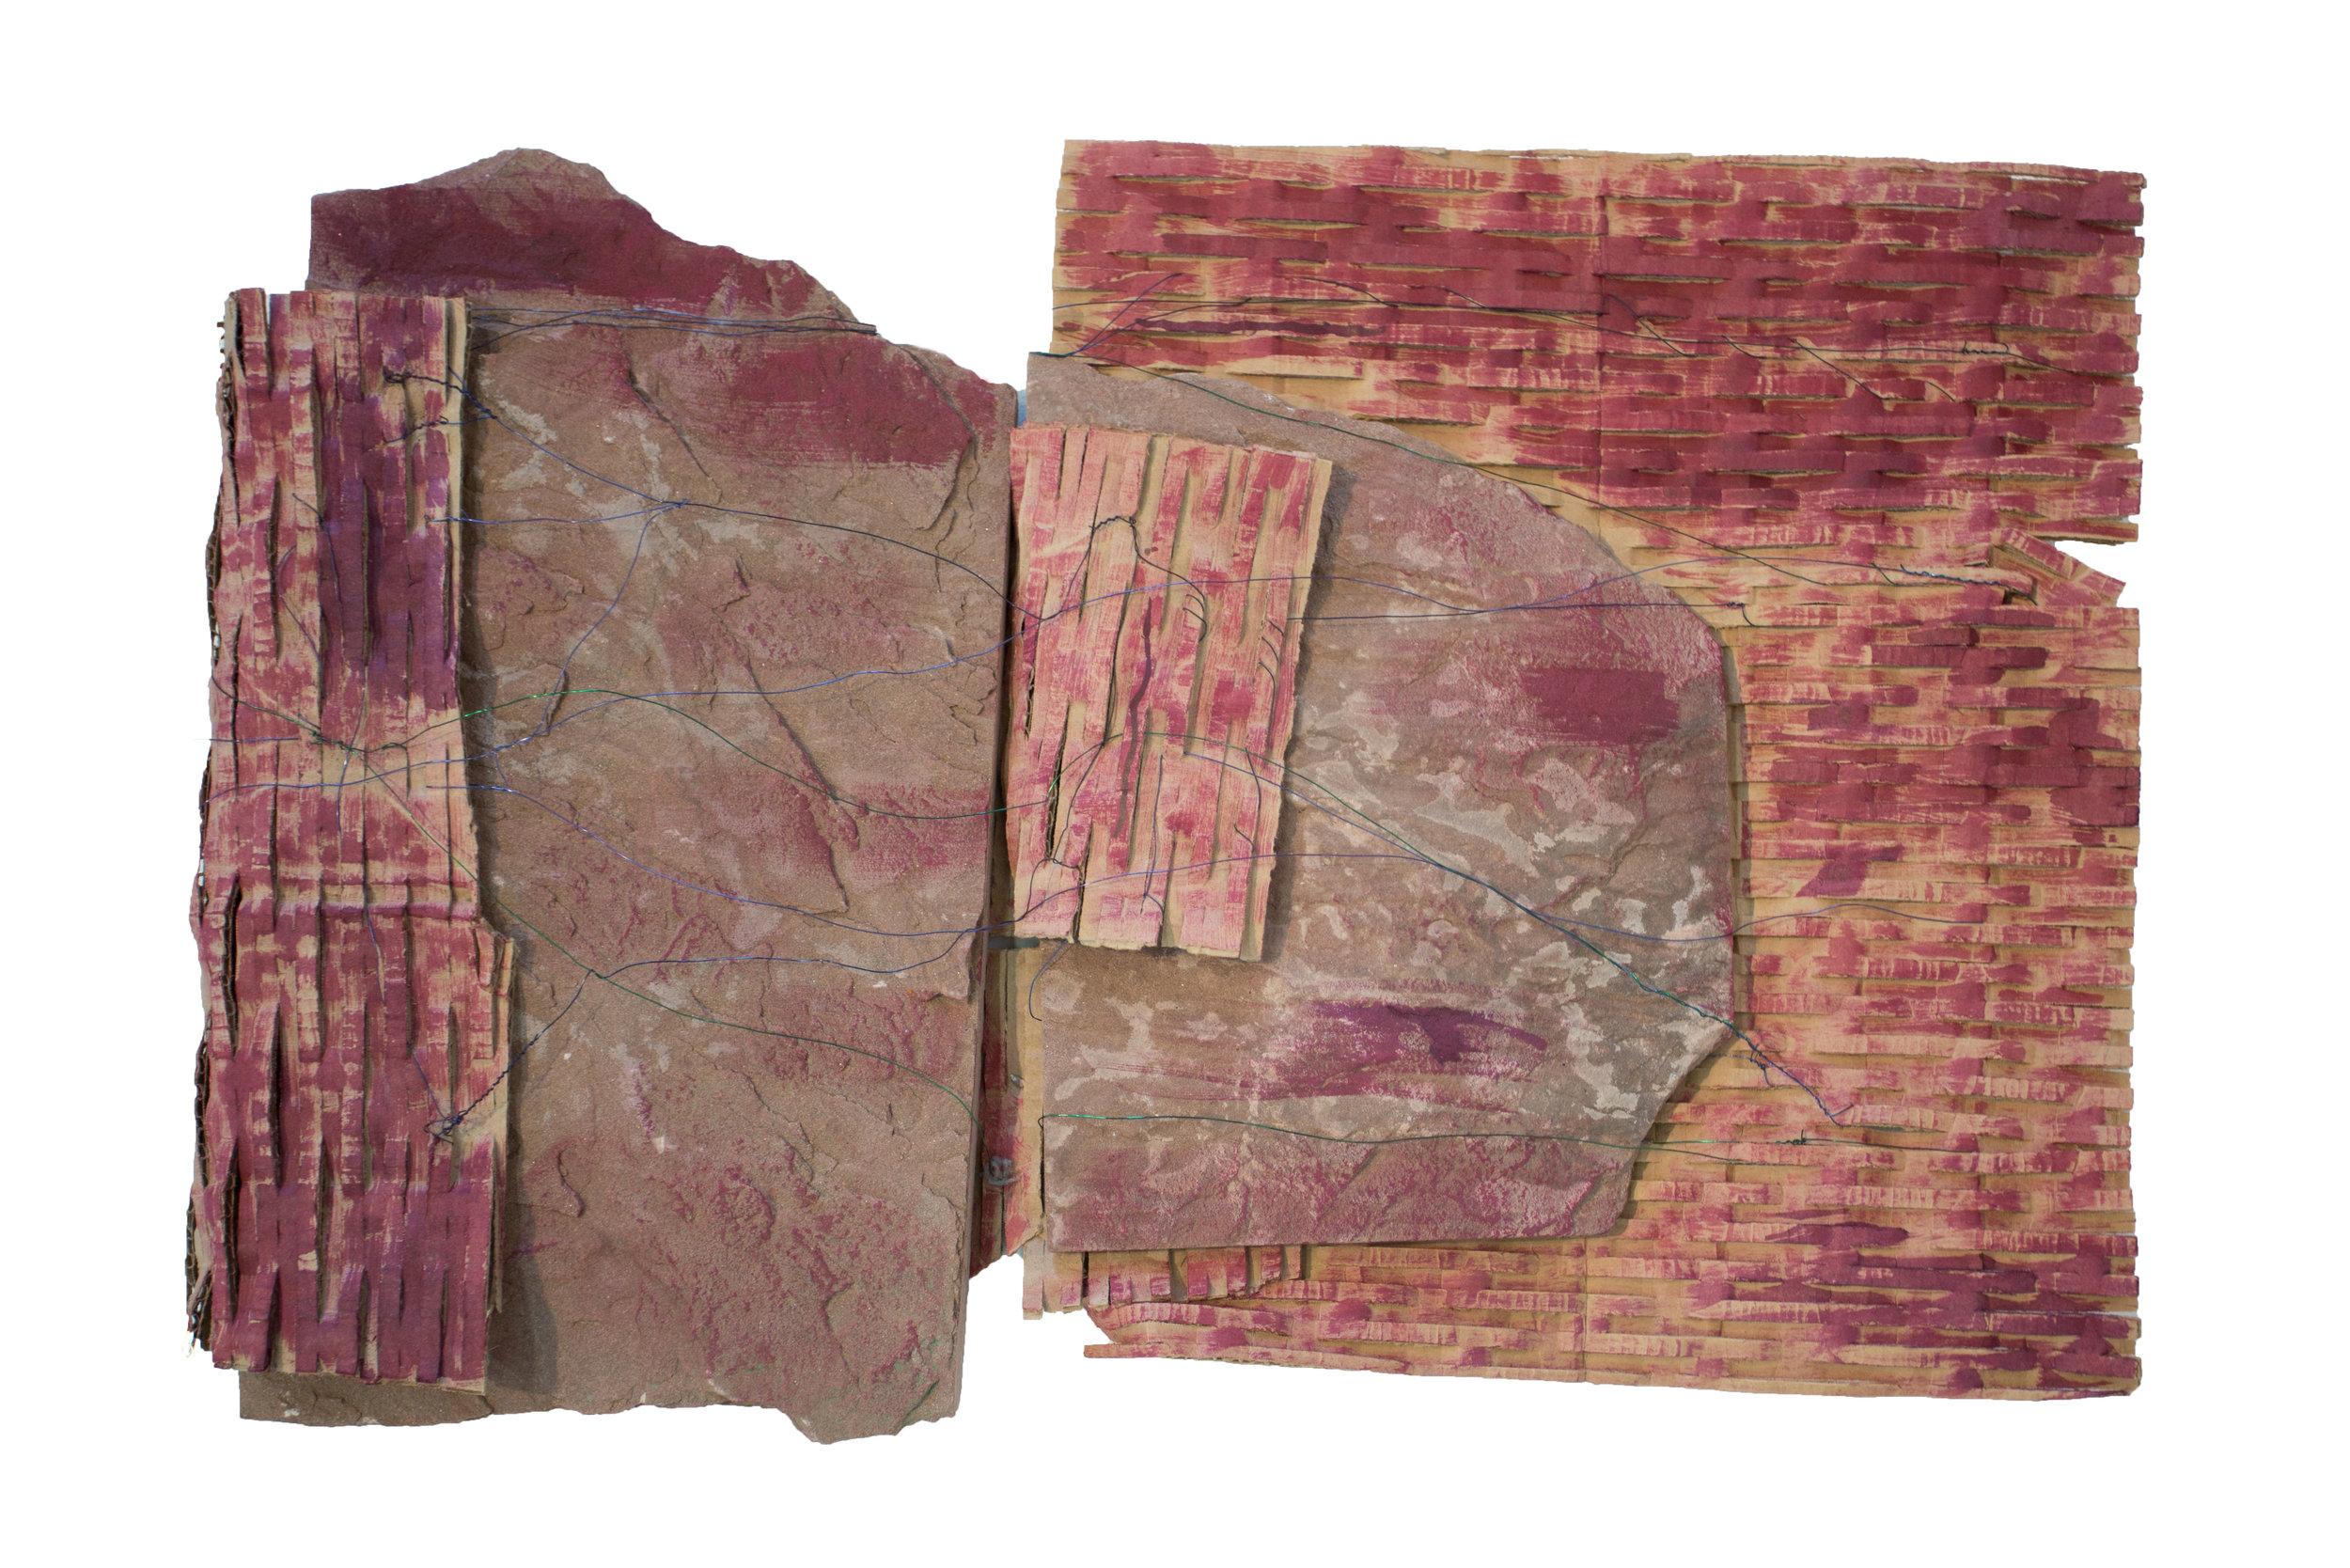 "Roadmap,  Red Sandstone, wire, cardboard, acrylic paint, 18"" x 12""x 4"", 2015"